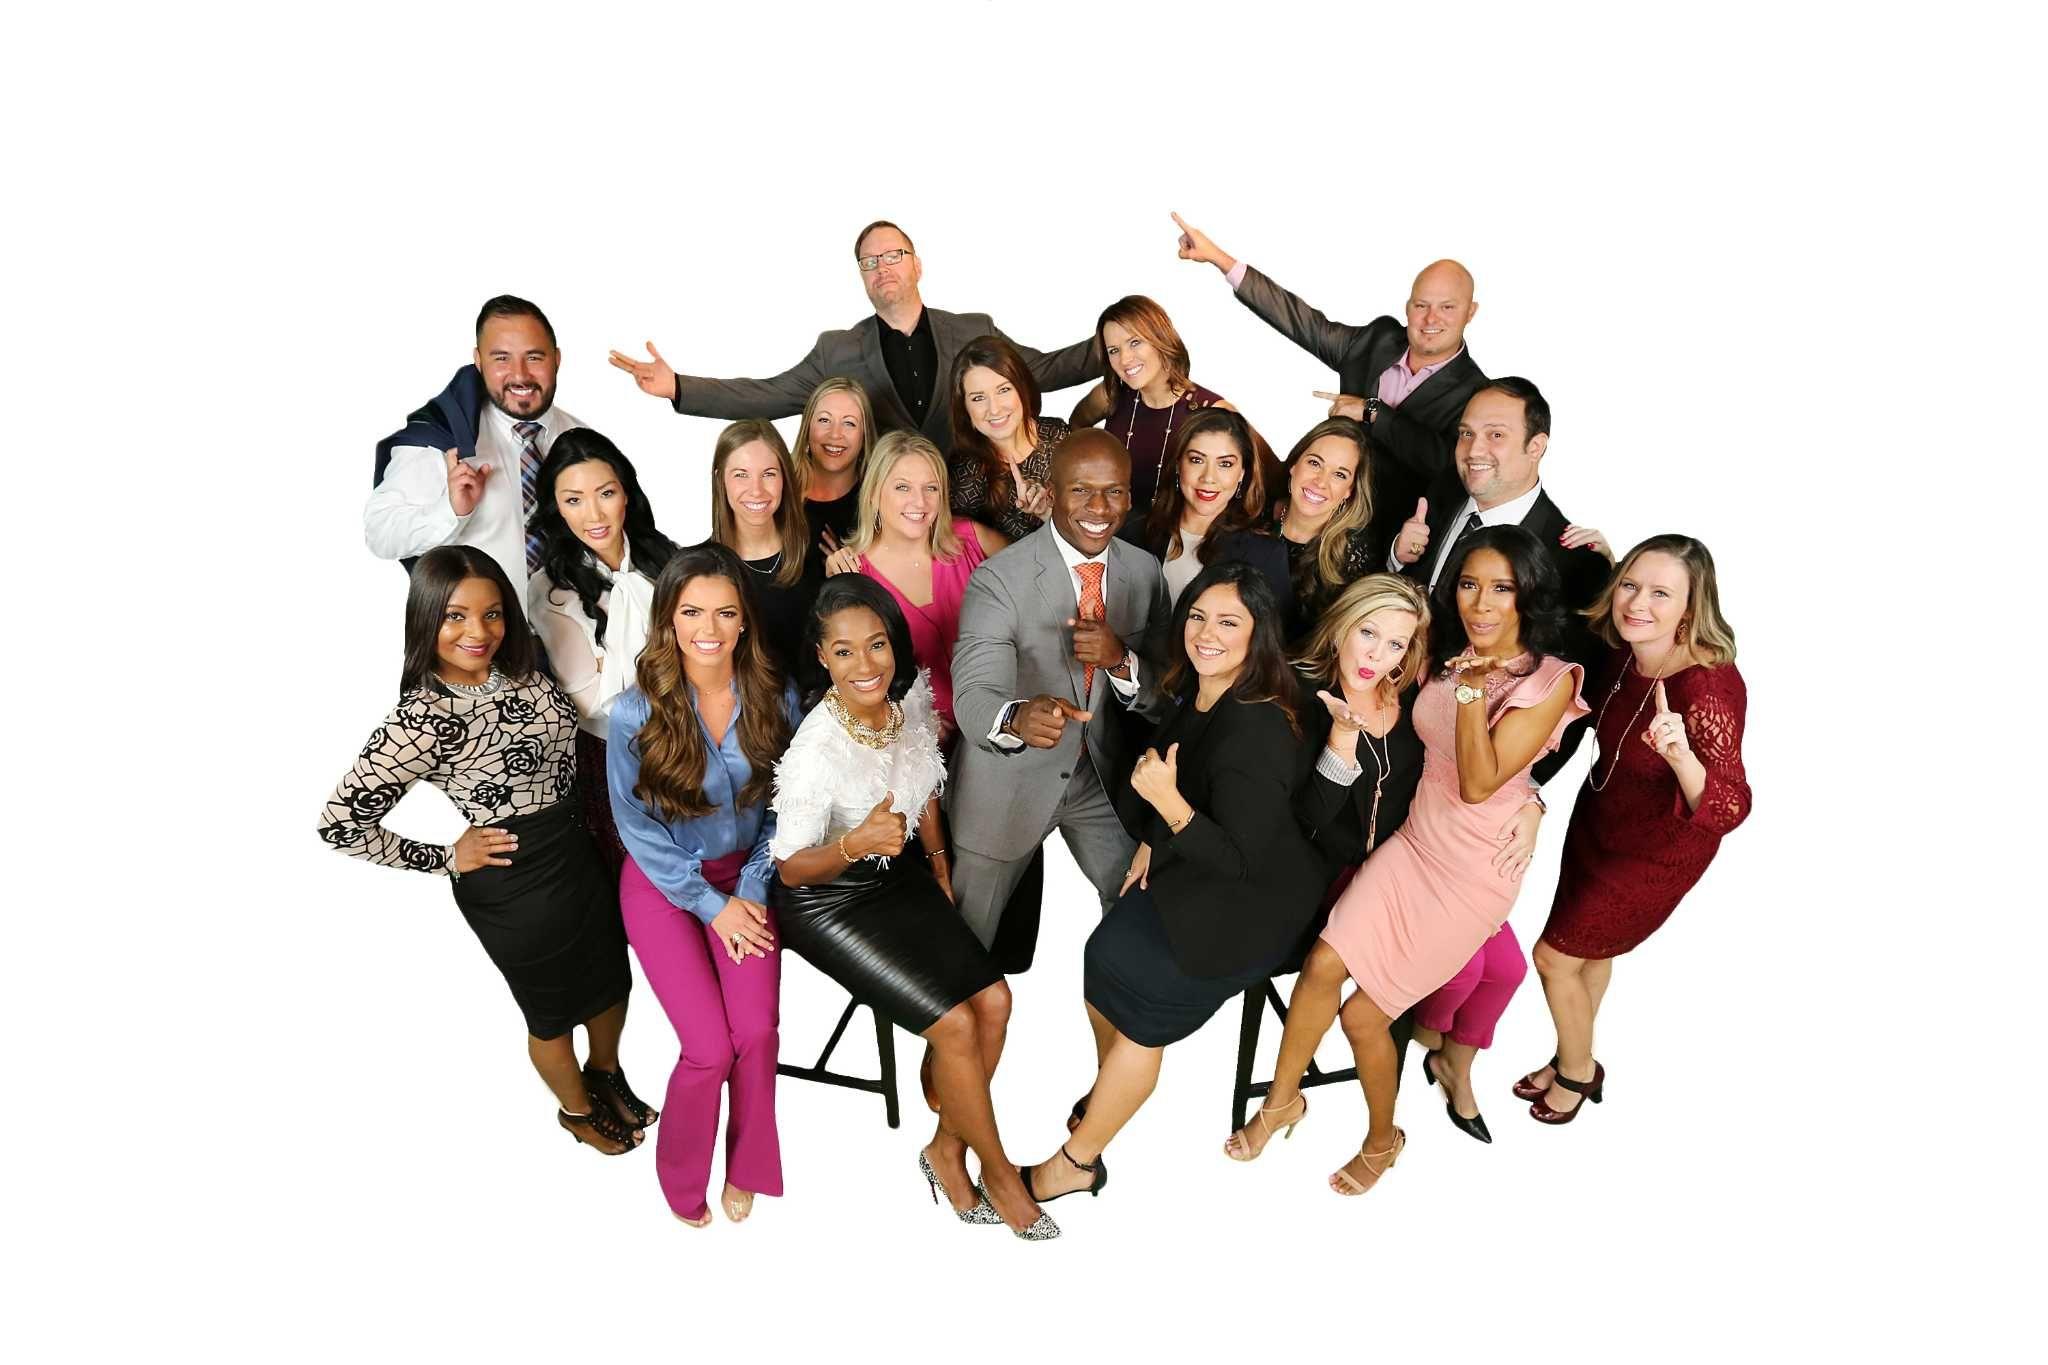 20 Under 40 Rising Stars in Real Estate Awards Stars